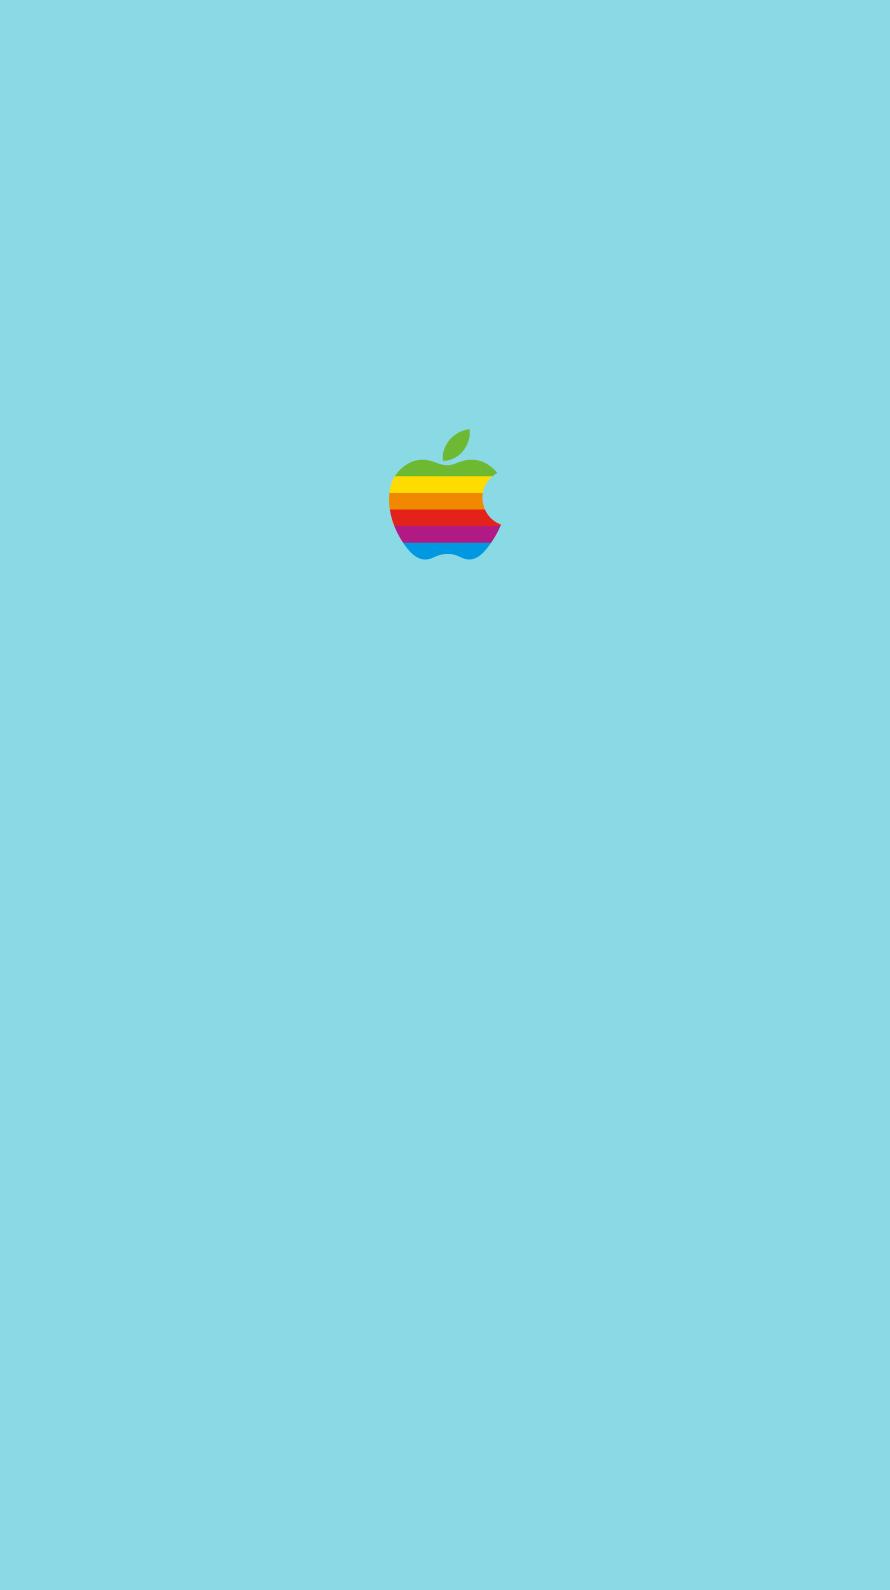 iPhone7, 6, 5用壁紙 Appleレインボーロゴ Blue